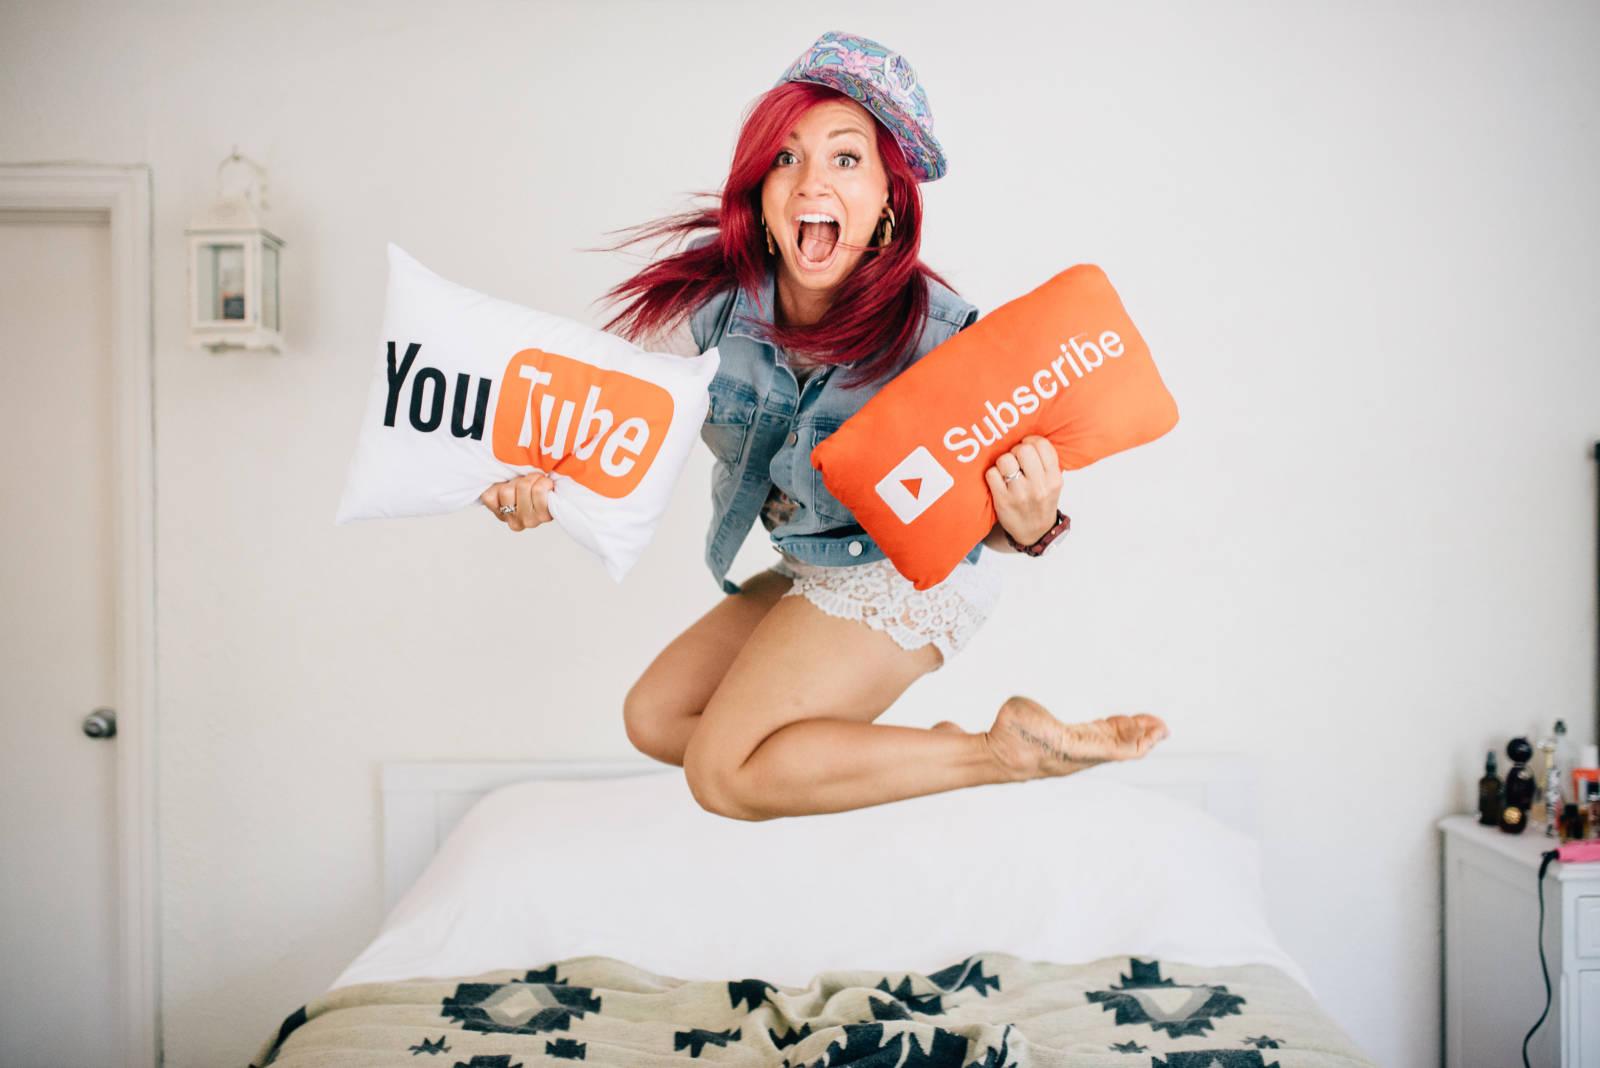 Kristen Sarah YouTuber